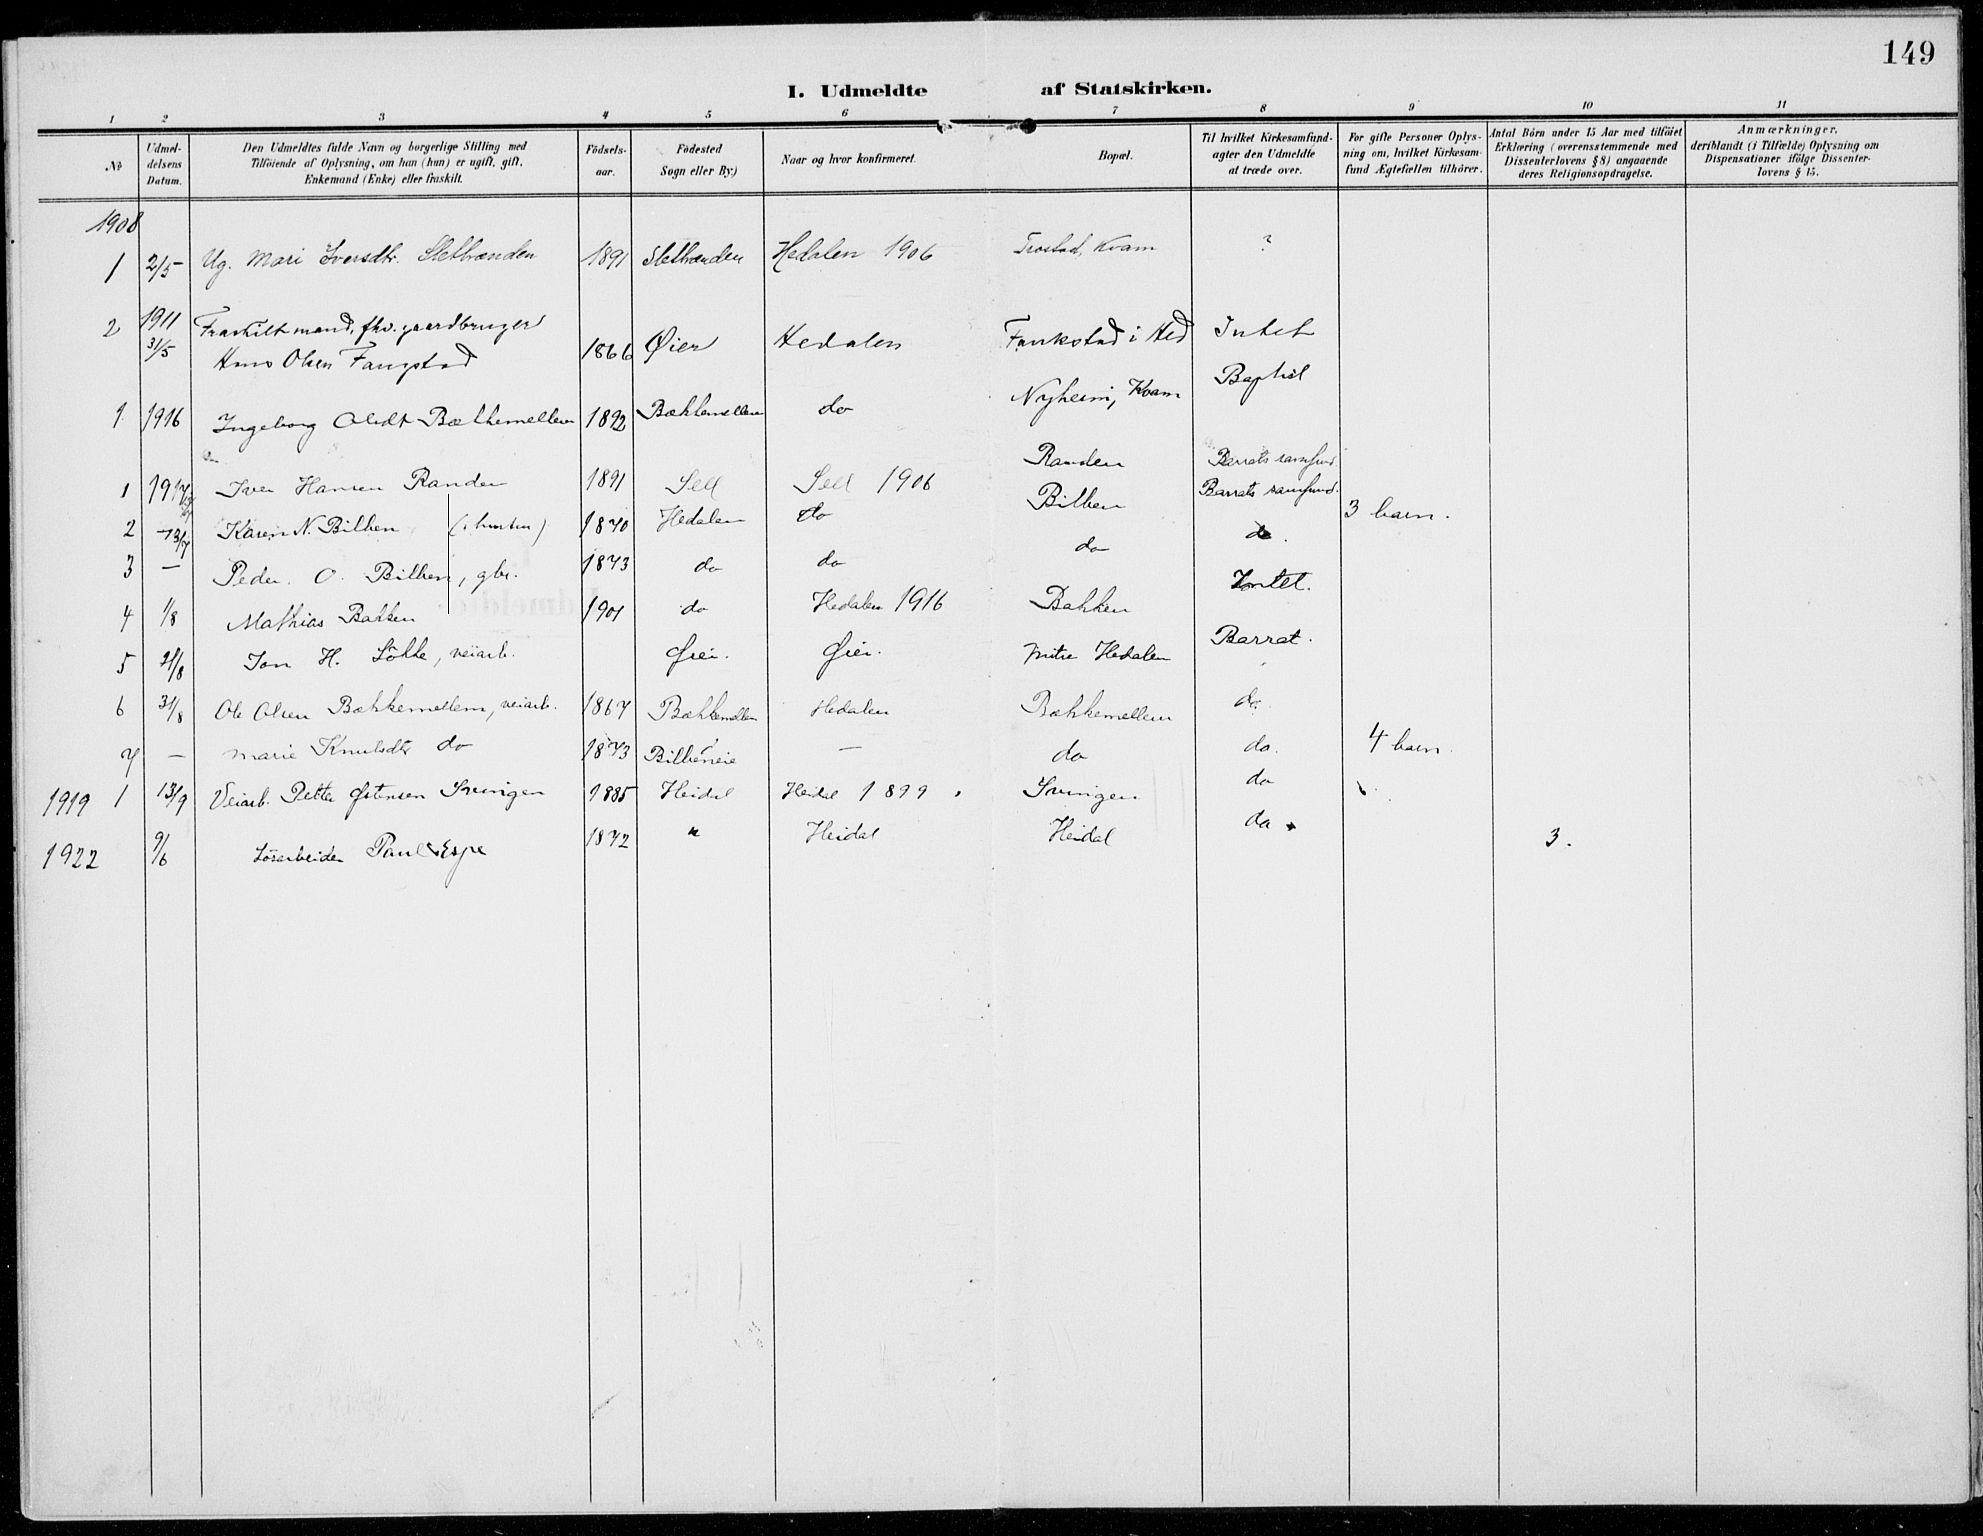 SAH, Sel prestekontor, Parish register (official) no. 1, 1905-1922, p. 149